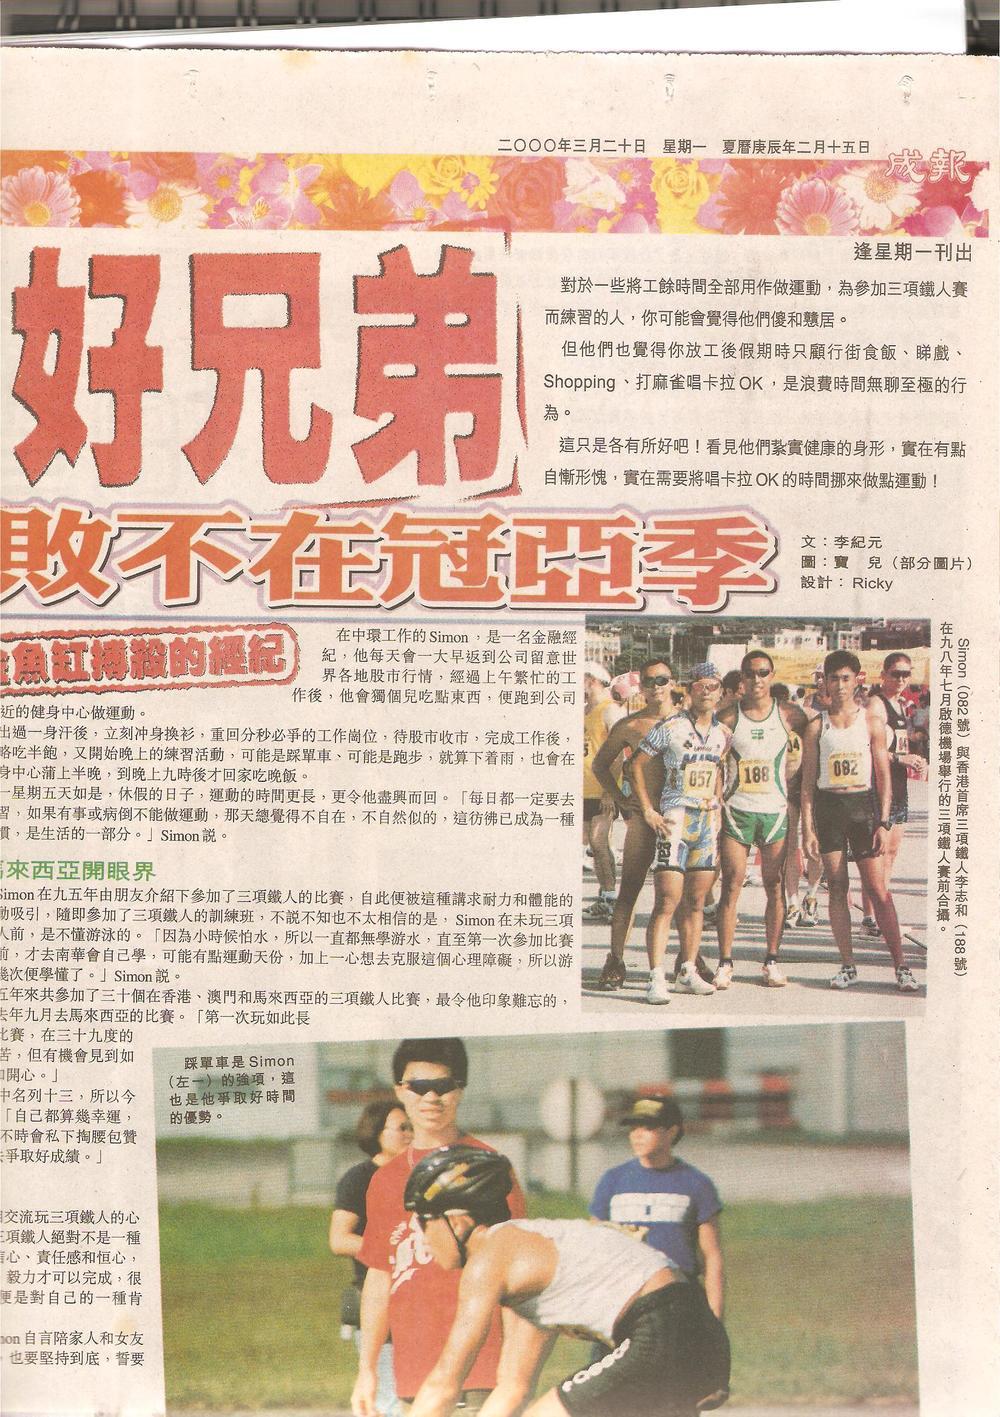 news-2-4.jpg